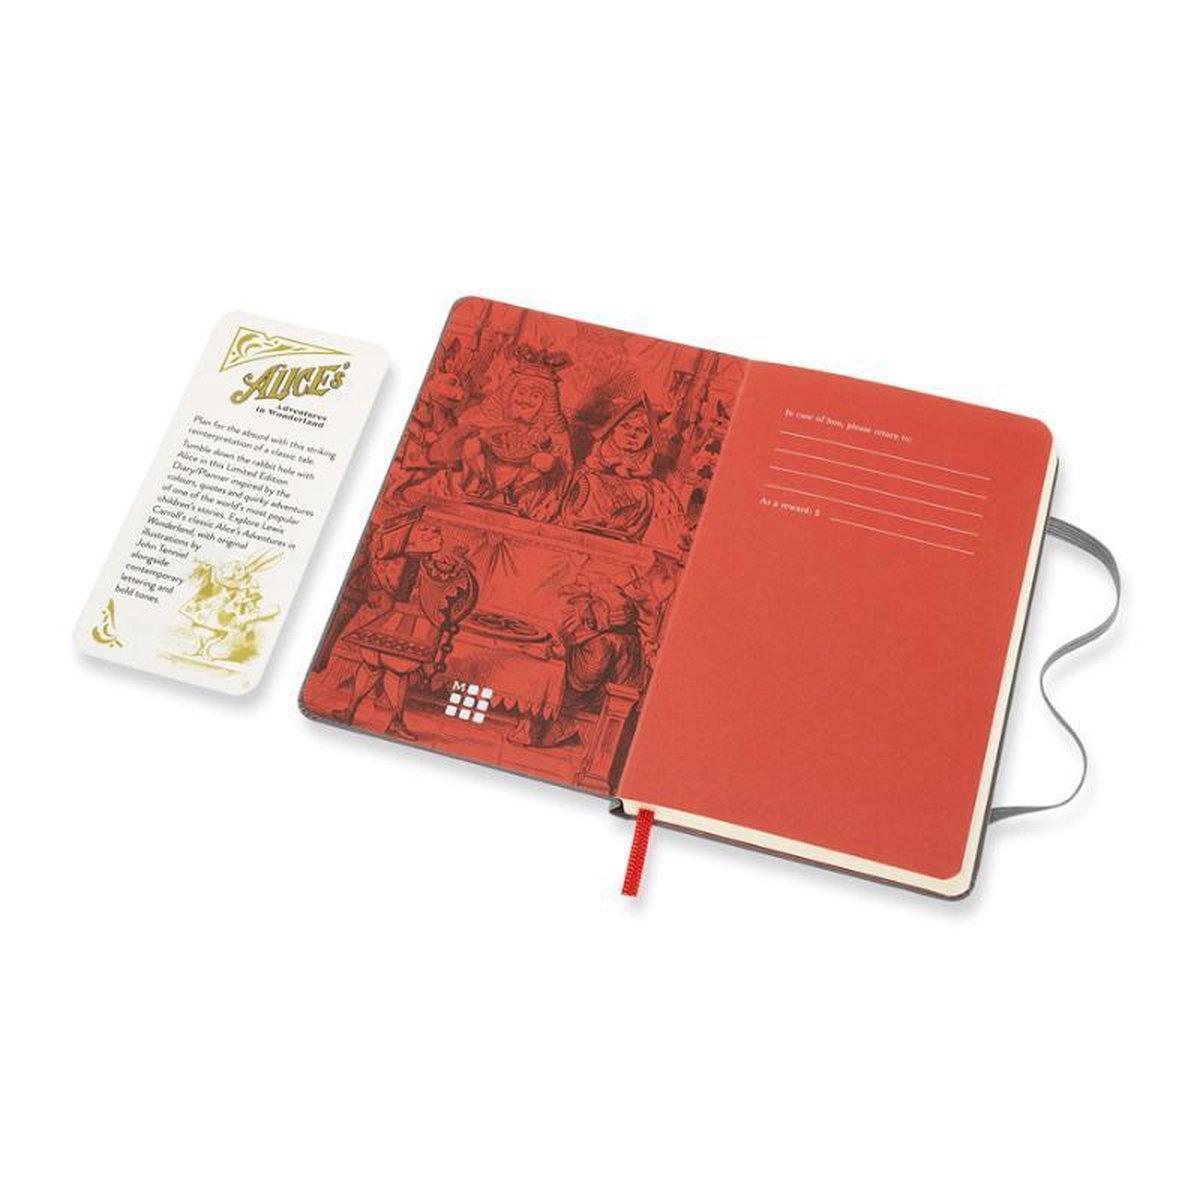 ,Moleskine 18 MND Agenda - 2020/21 - LE Planner - Alice In Wonderland - Wekelijks - Pocket (9x14 cm) - Paars - Harde Kaft